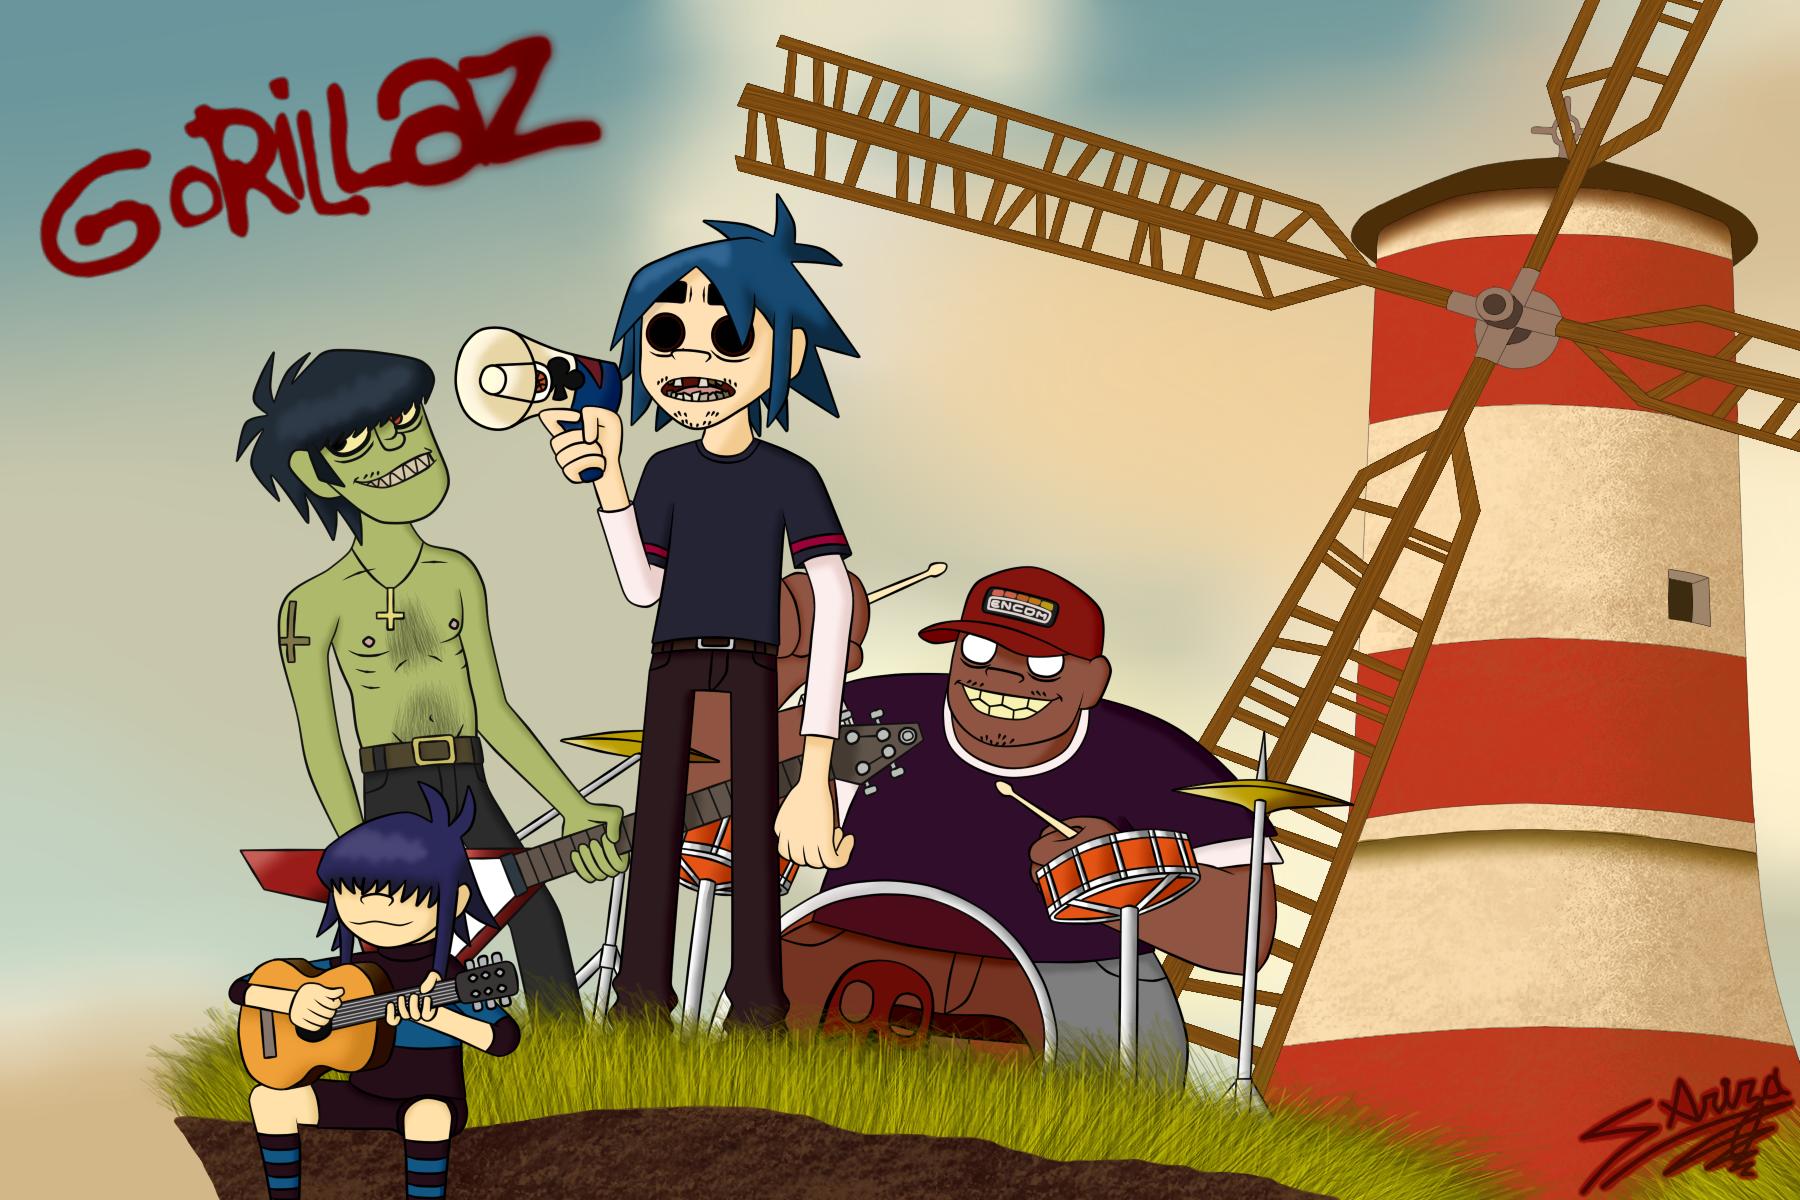 Gorillaz, Feel Good Inc.